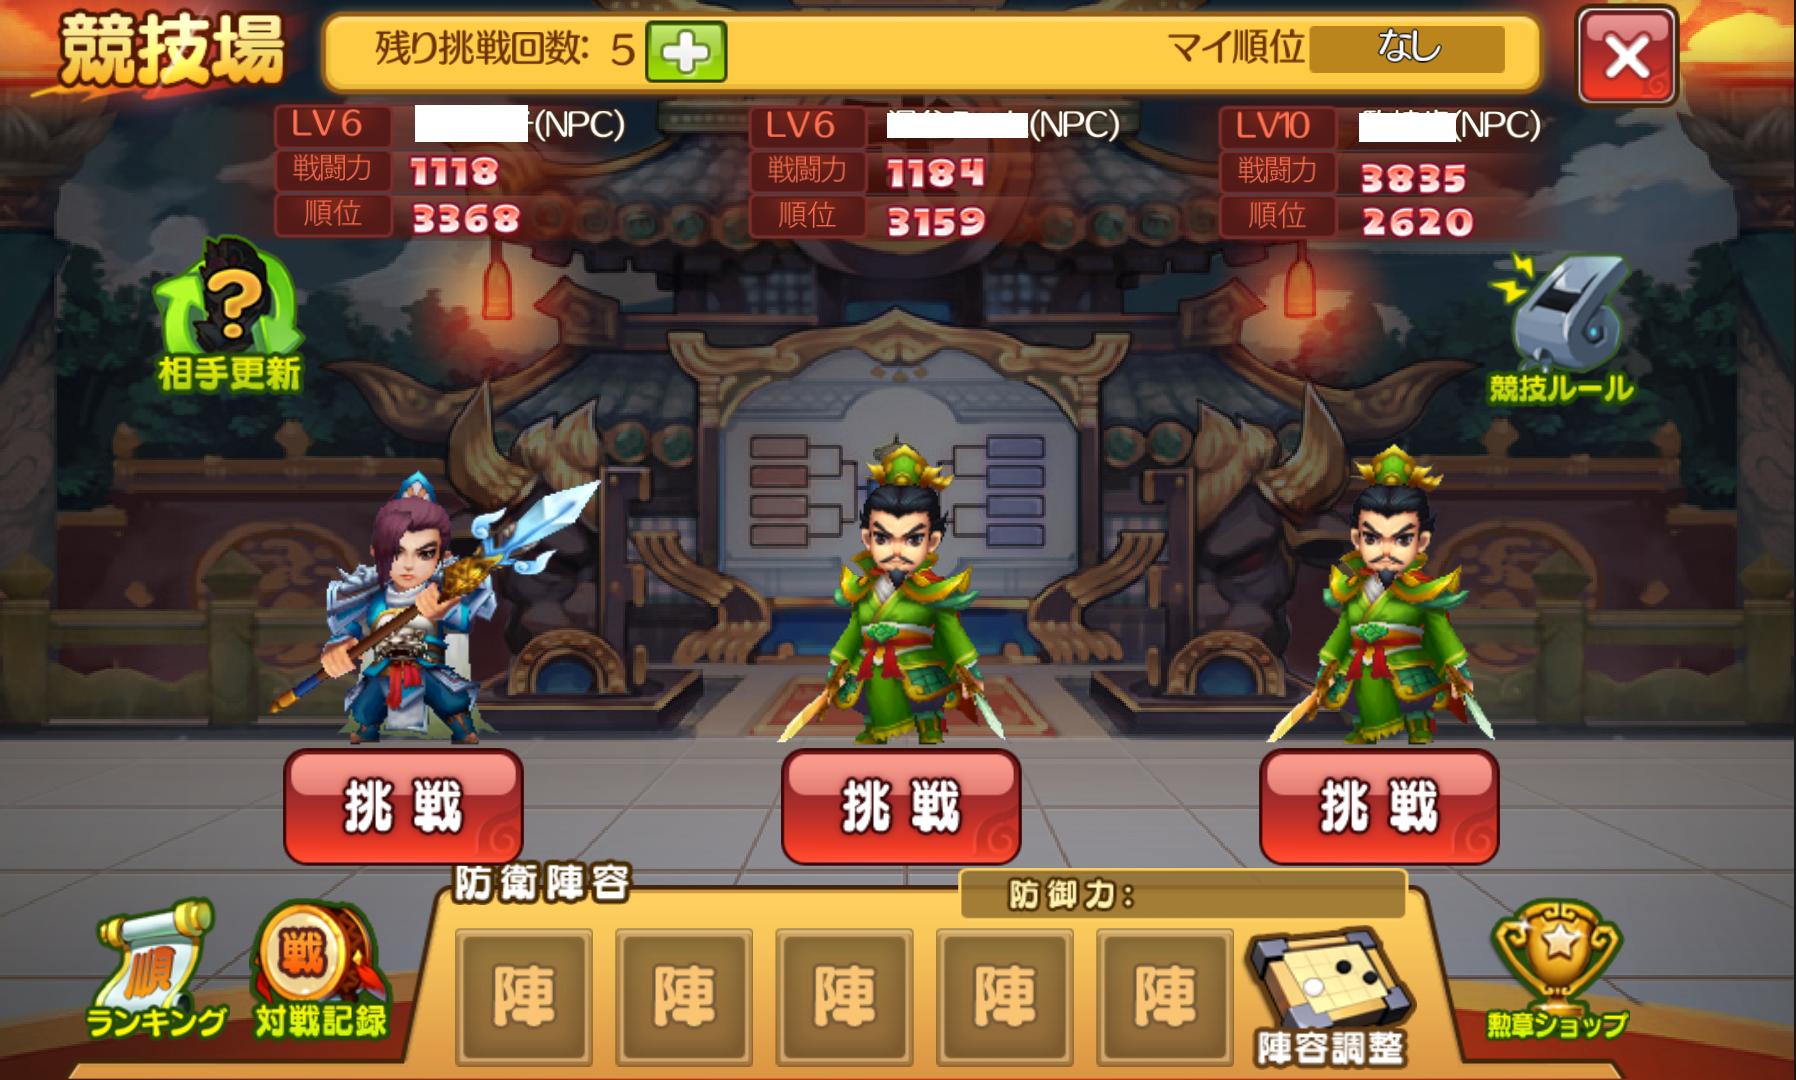 androidアプリ 三国志繚乱バトル攻略スクリーンショット7